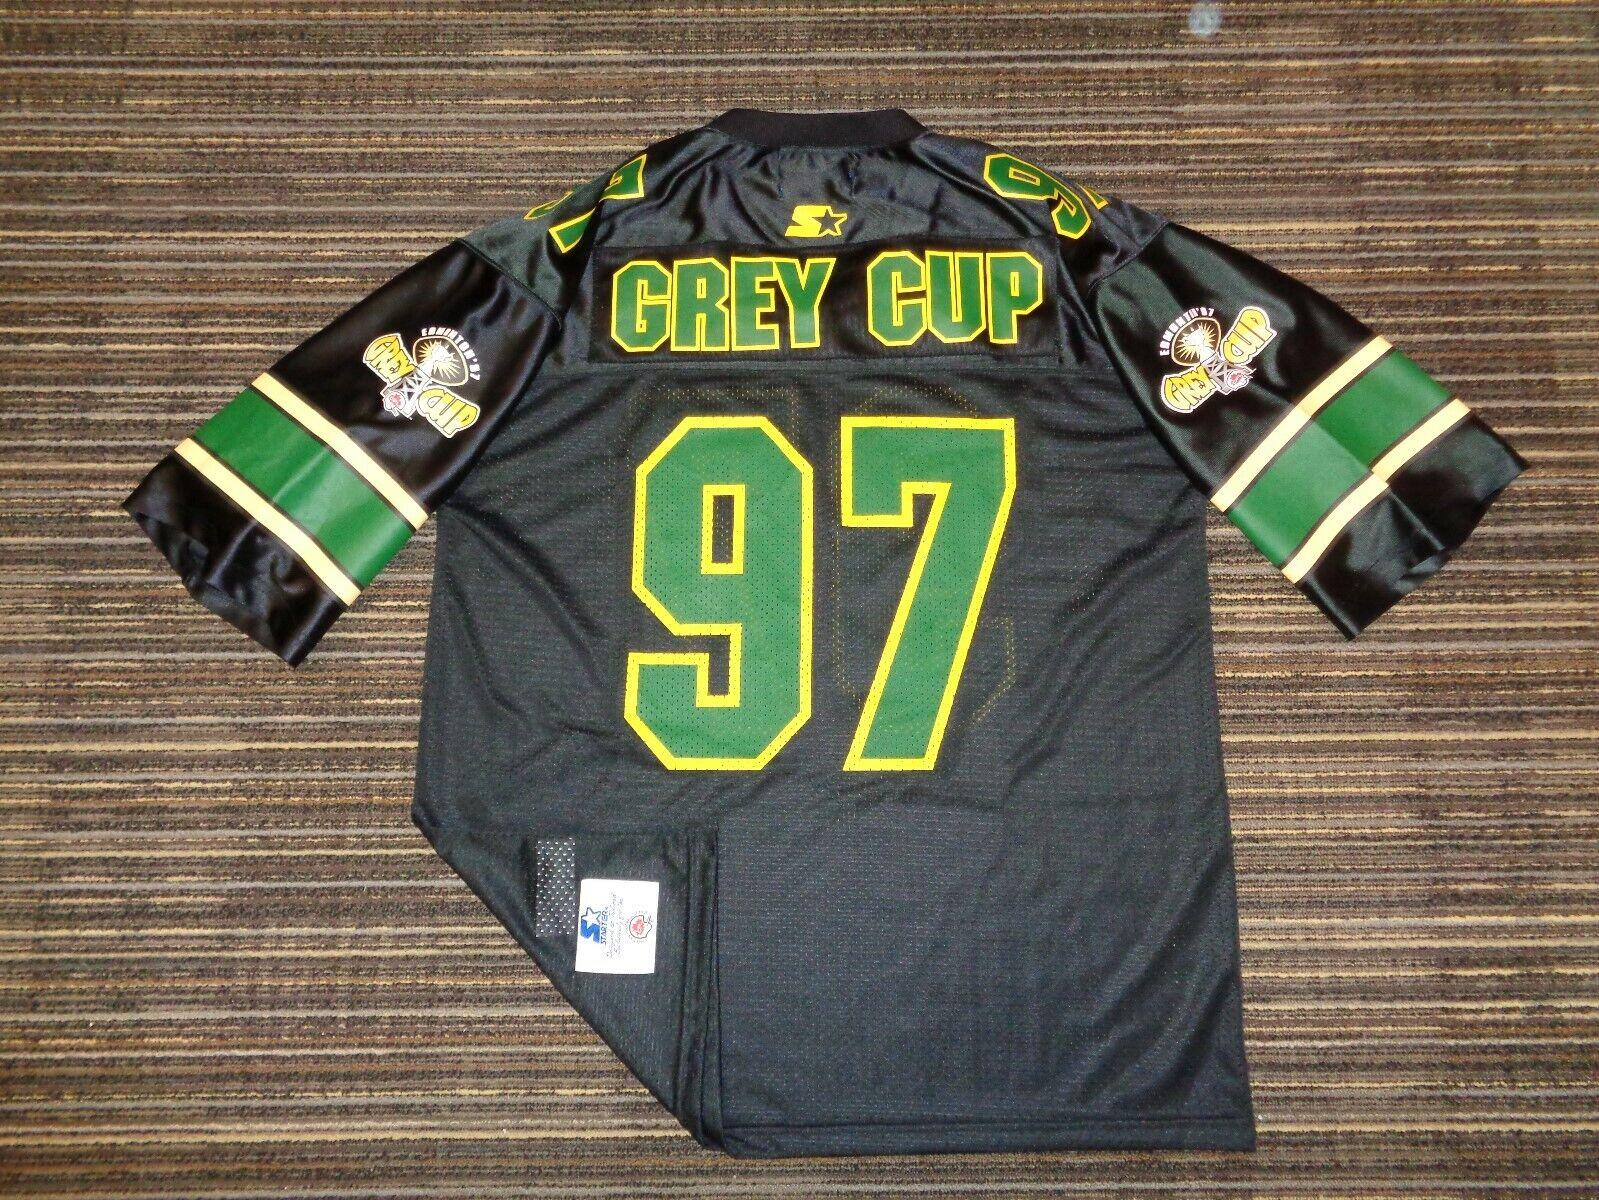 1997 EDMONTON ESKIMOS STARTER MENS CFL CANADIAN GREY CUP GAME FOOTBALL JERSEY LG - $44.99